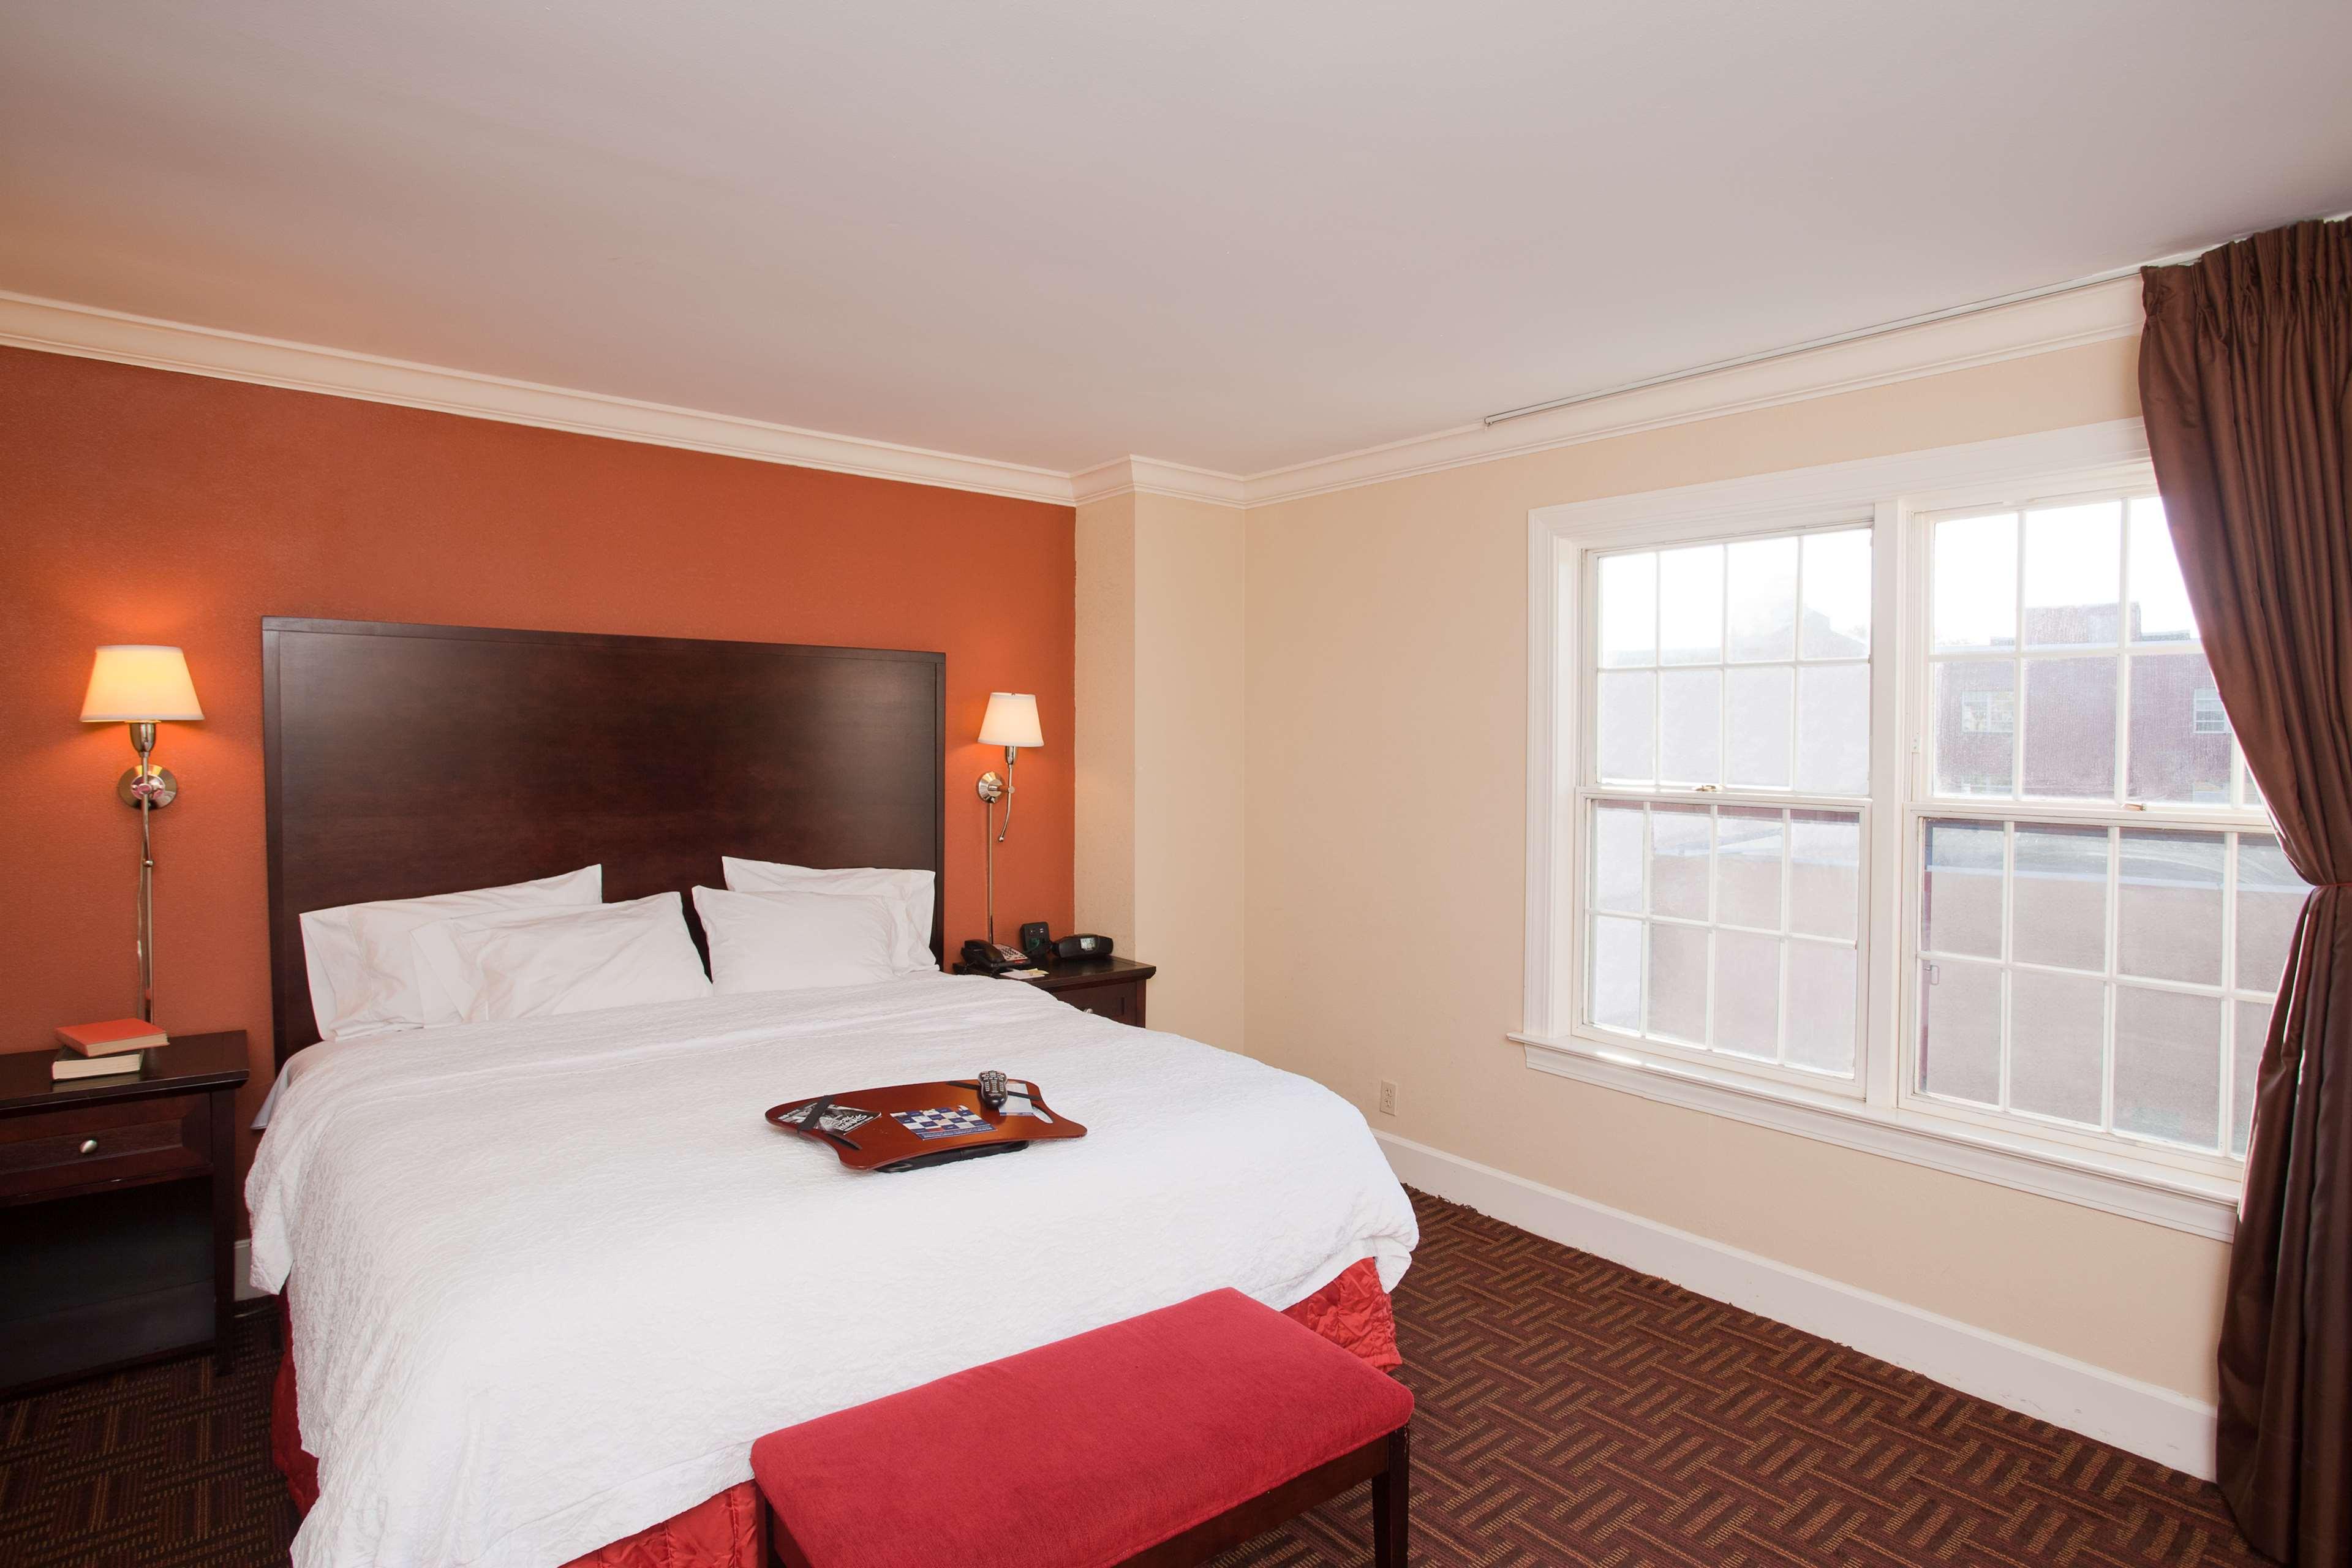 Hampton Inn & Suites Stamford image 28